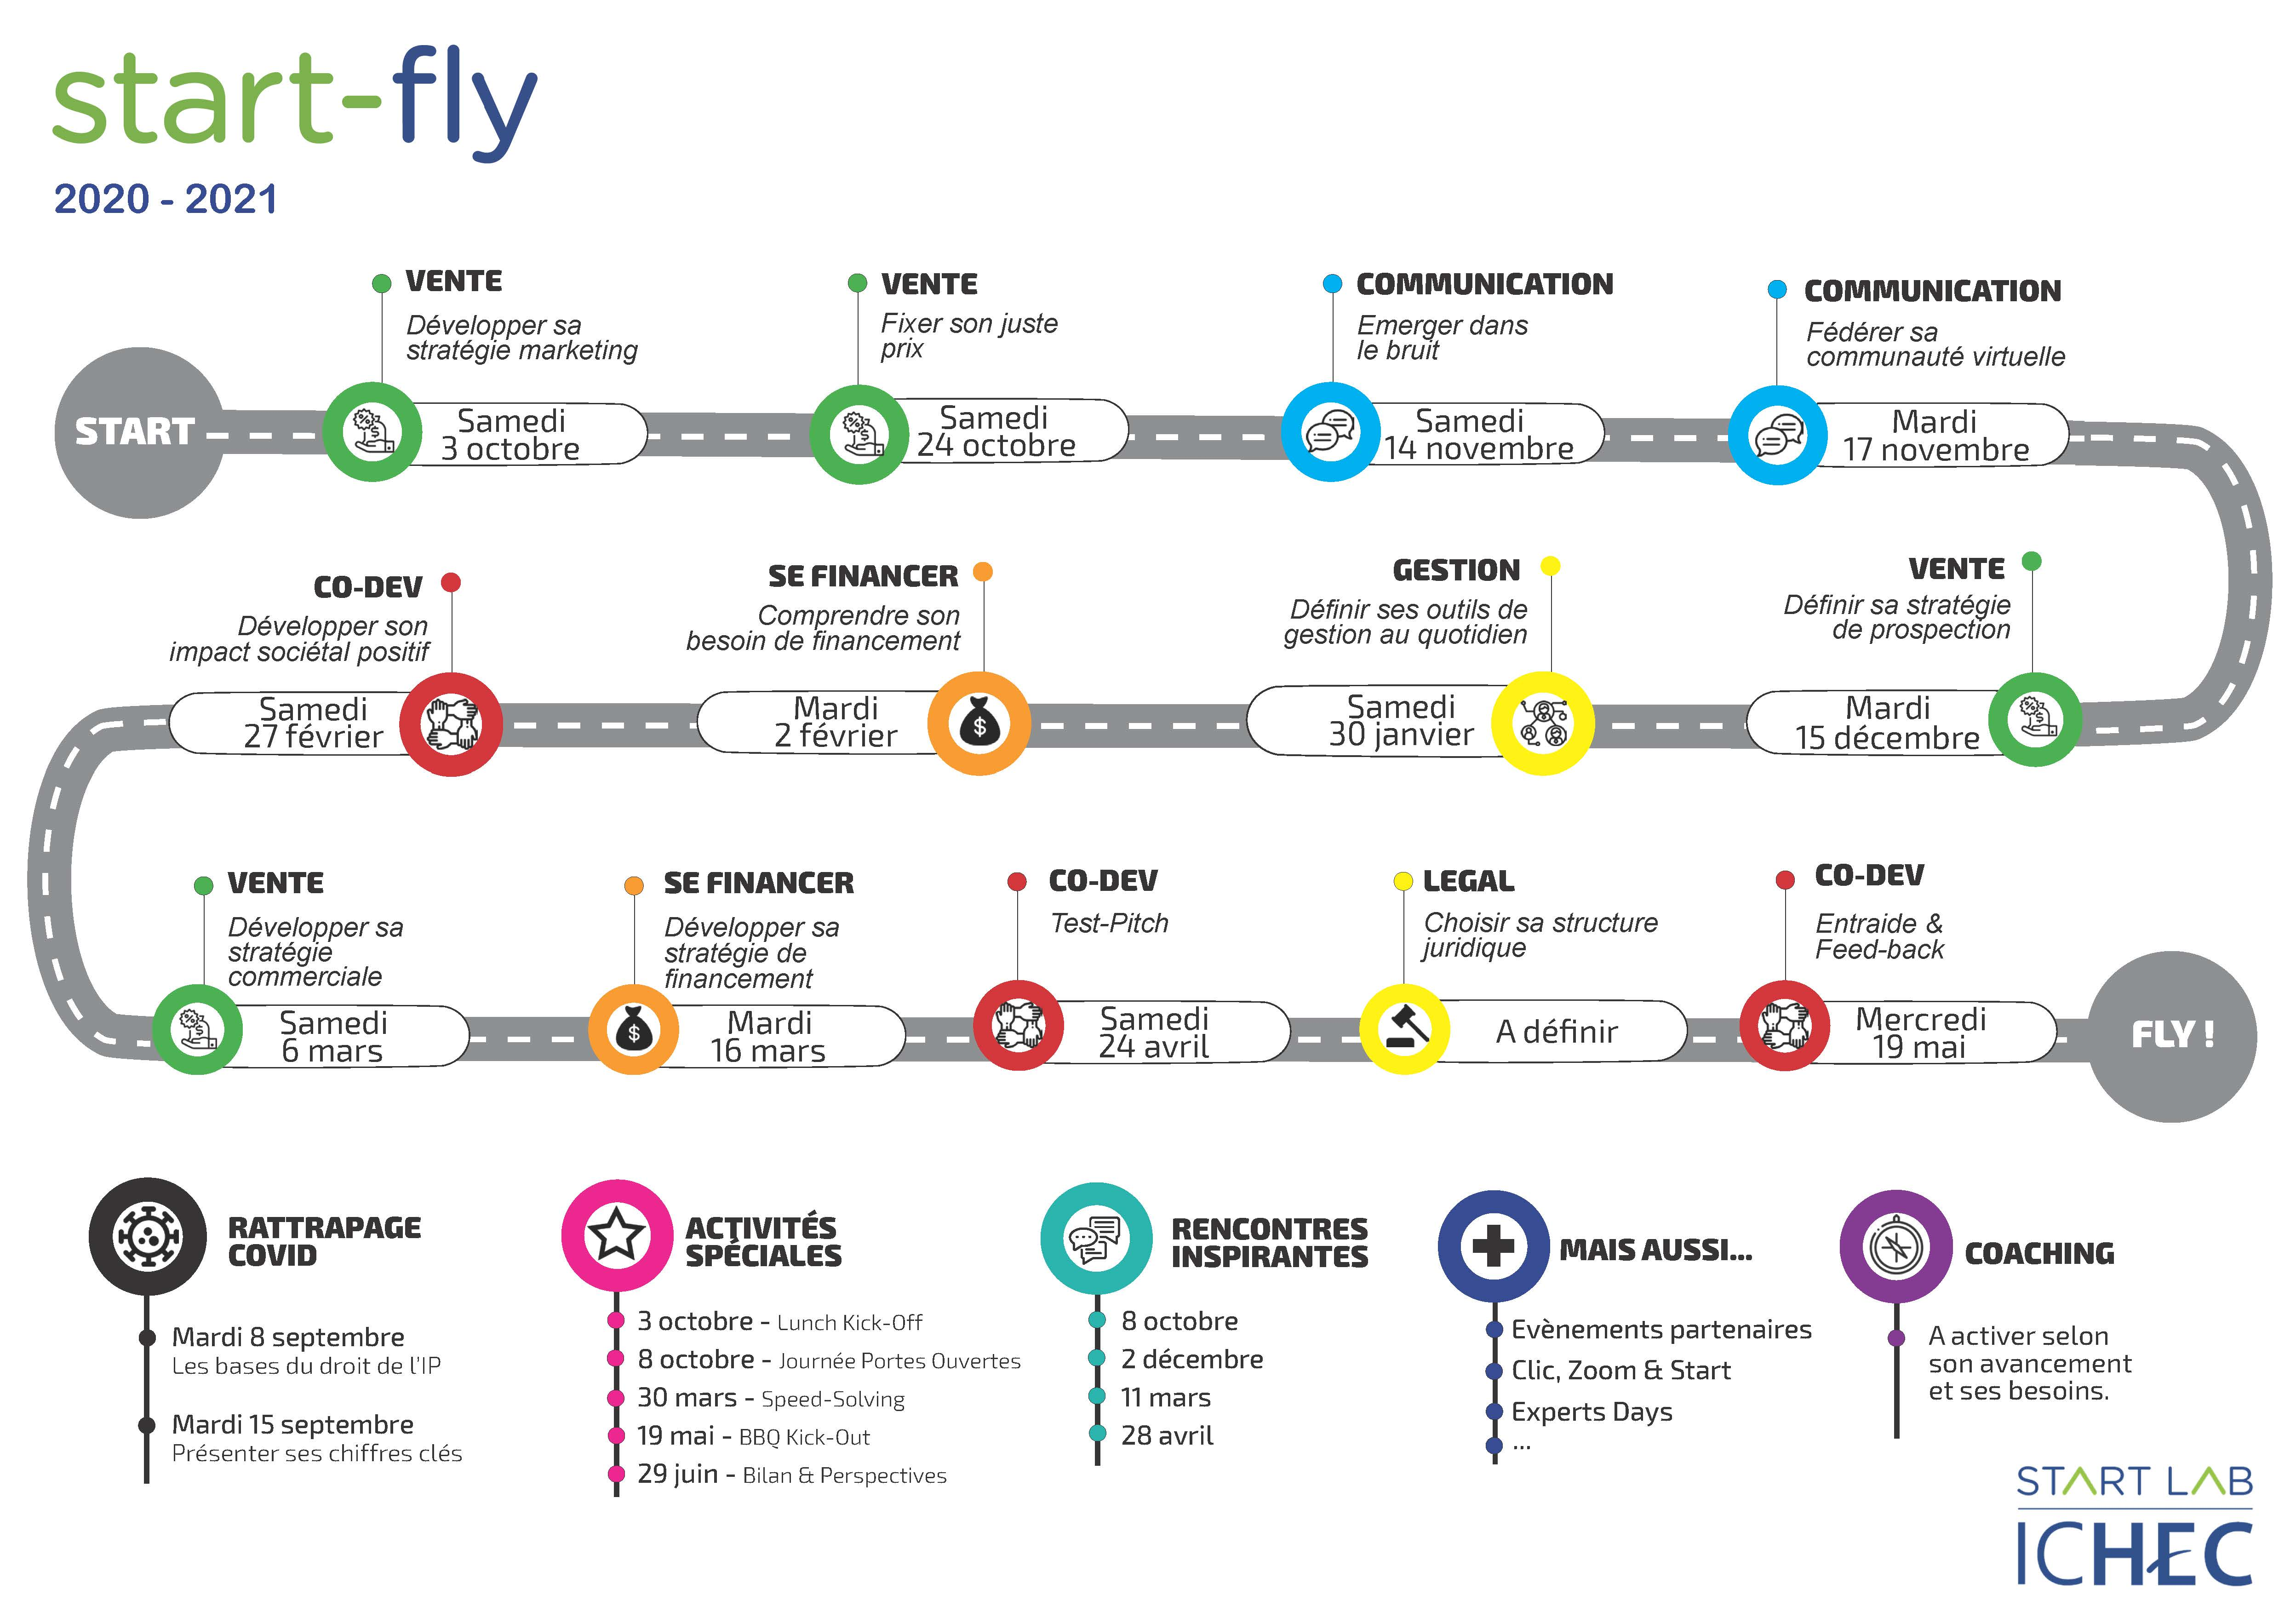 Start-fly programme 2020-2021